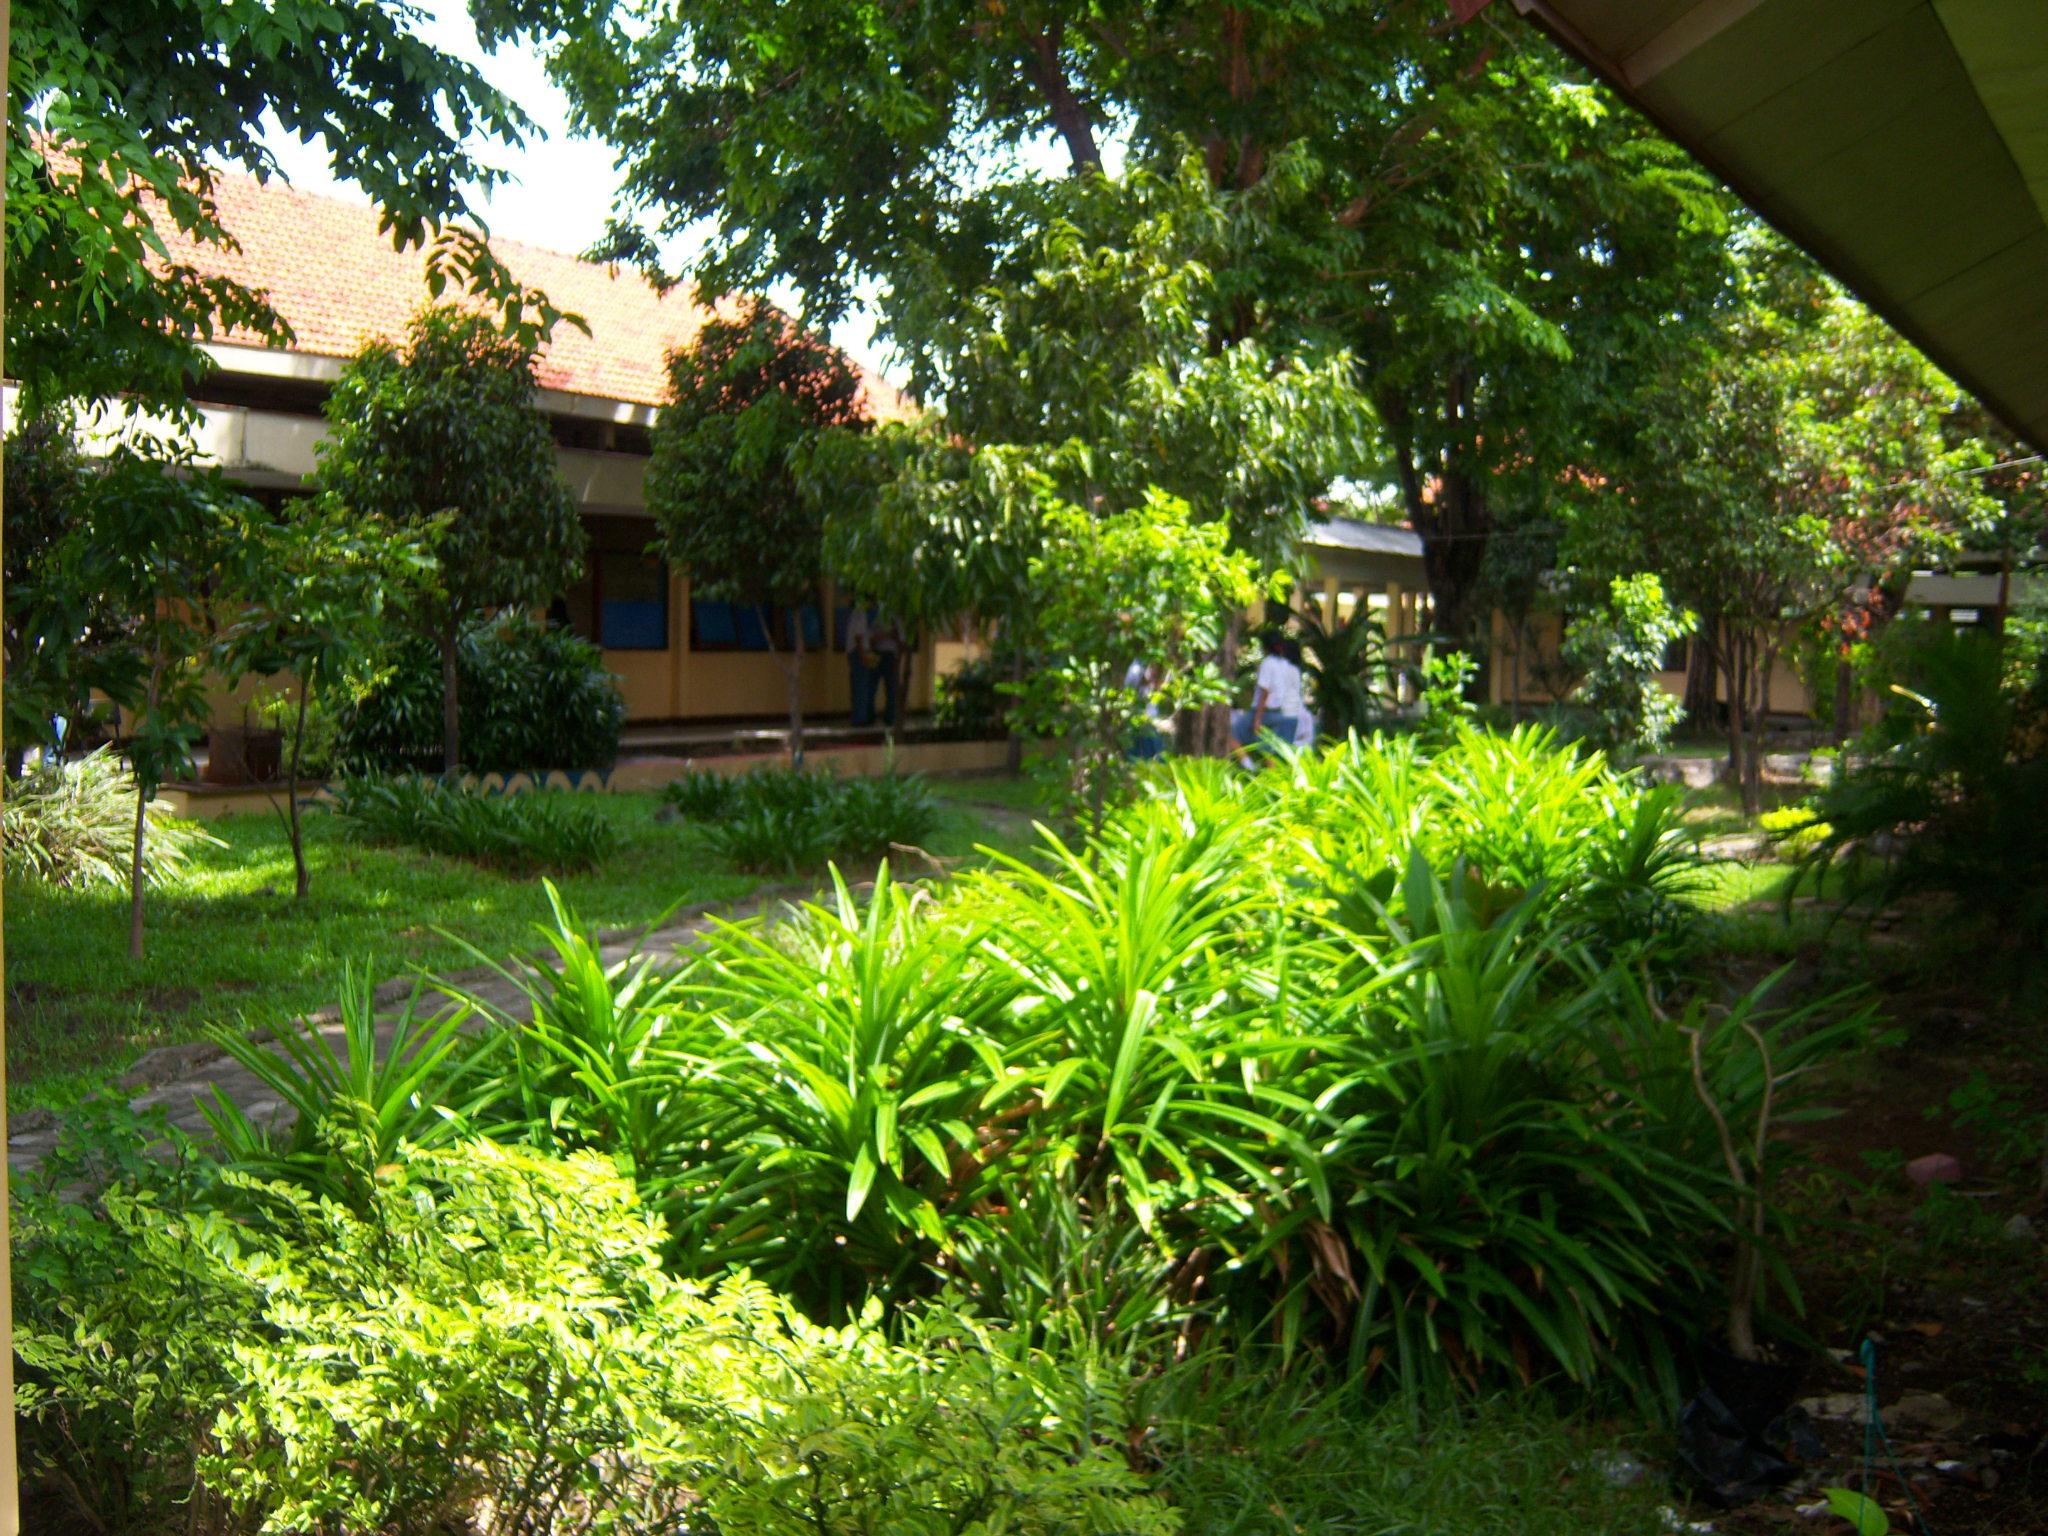 LIngkungan Bersih, Hijau , Asri dan Rindang | SMA NEGERI 16 SURABAYA